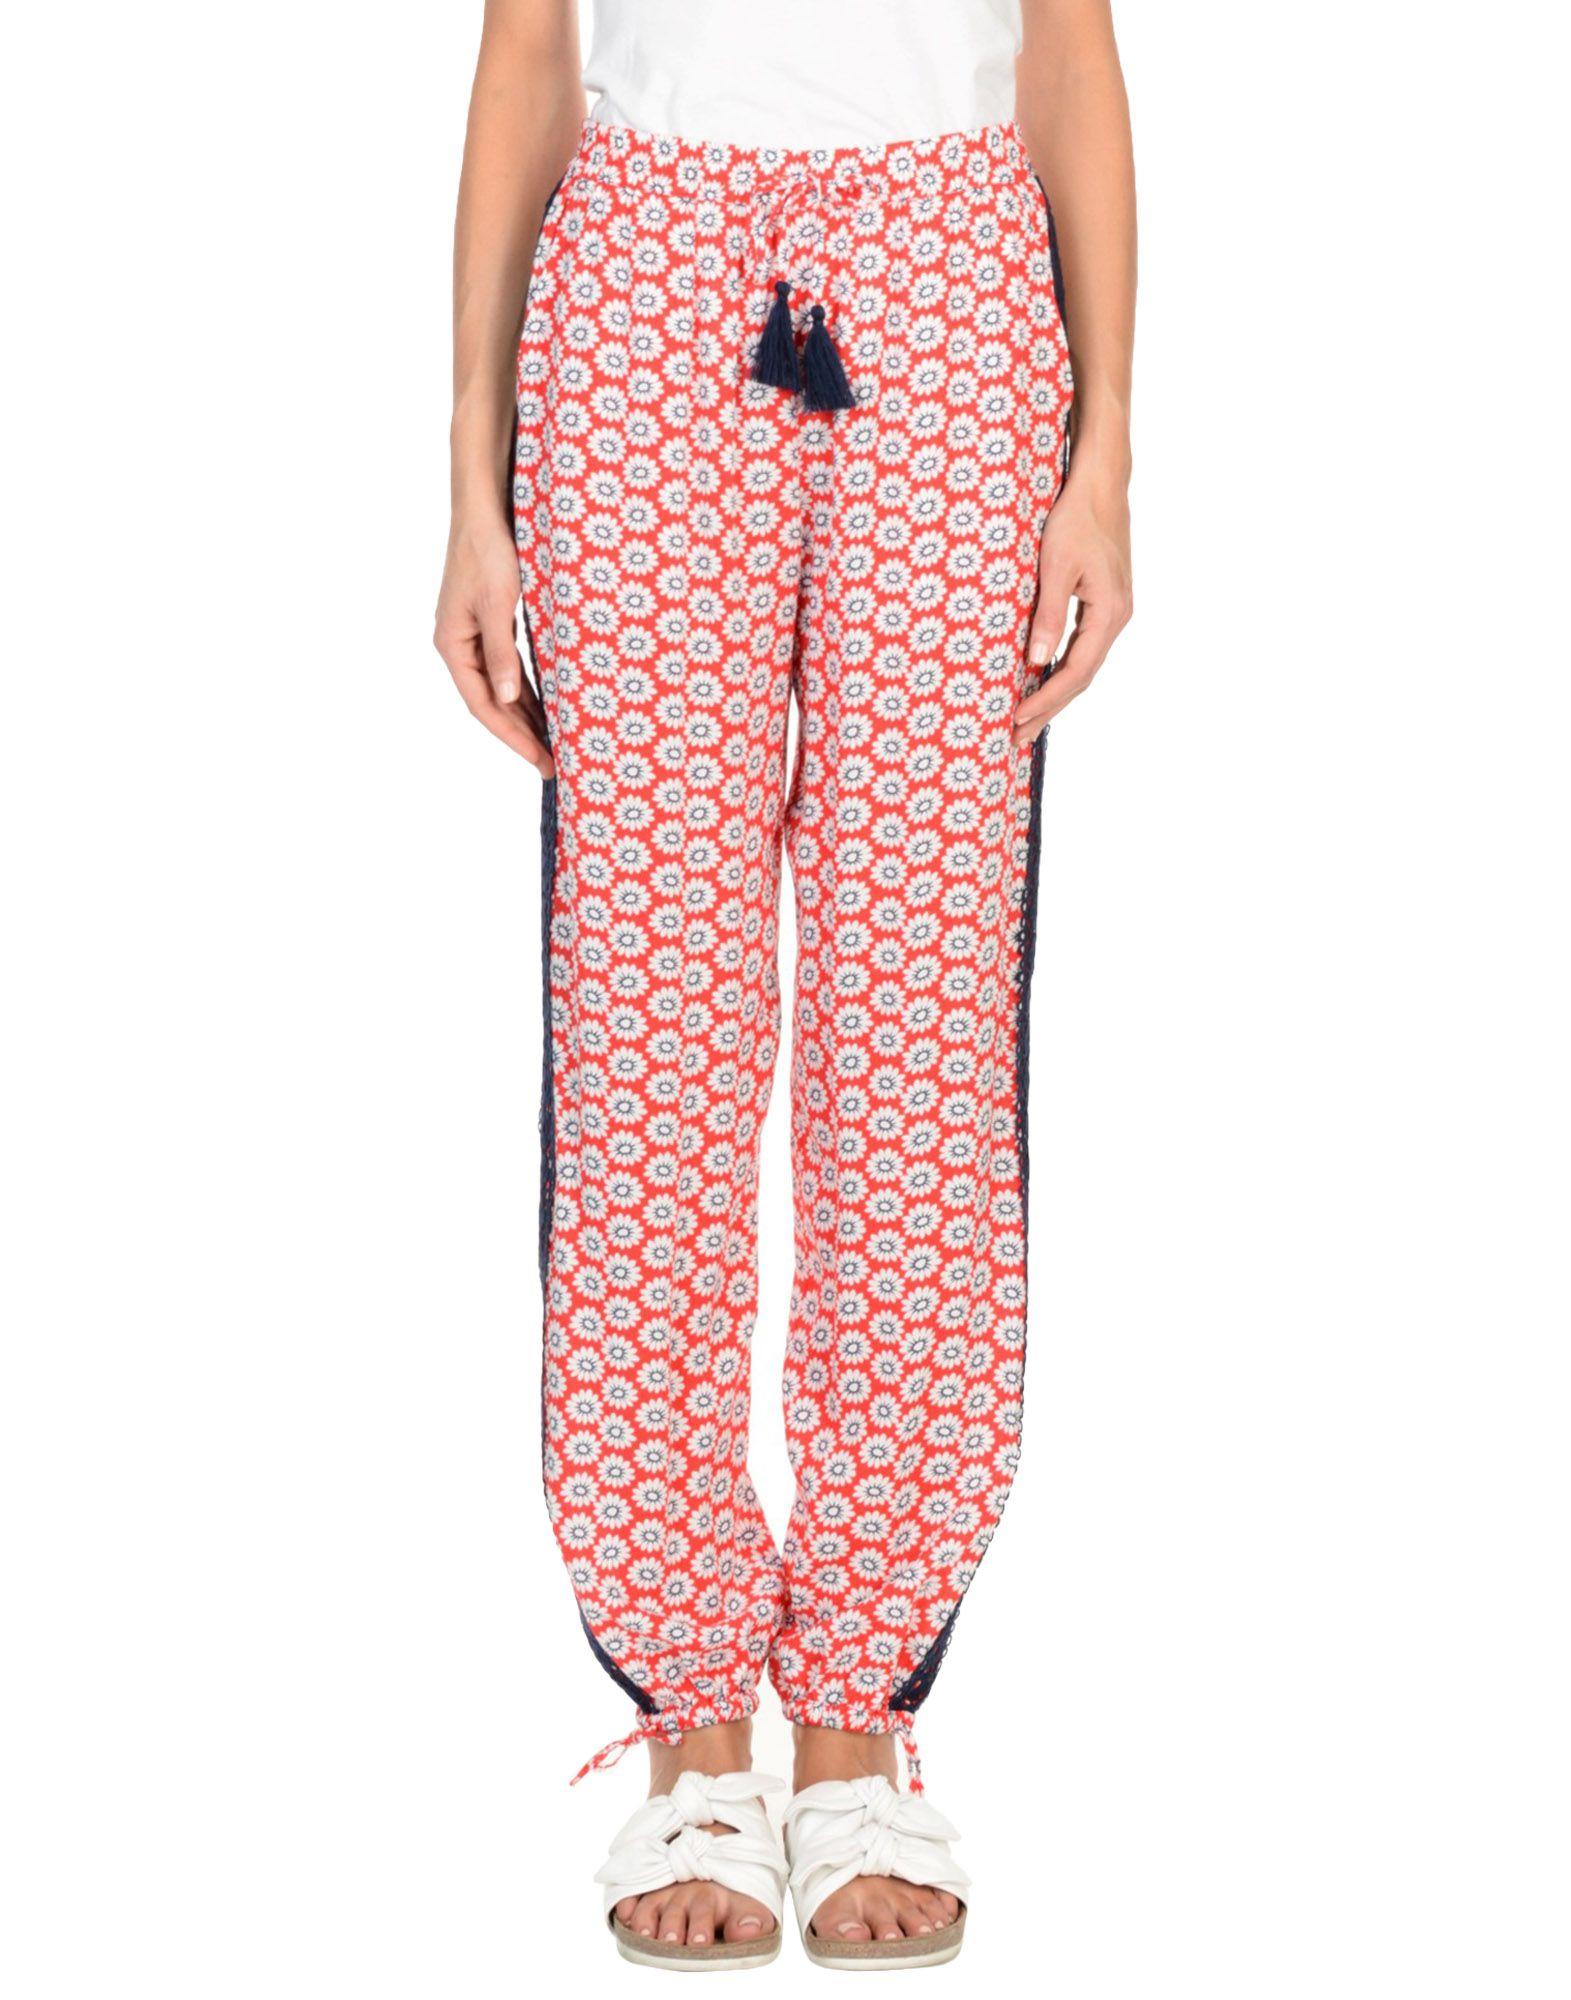 Pantalone Tory Burch Donna - Acquista online su yXlrk